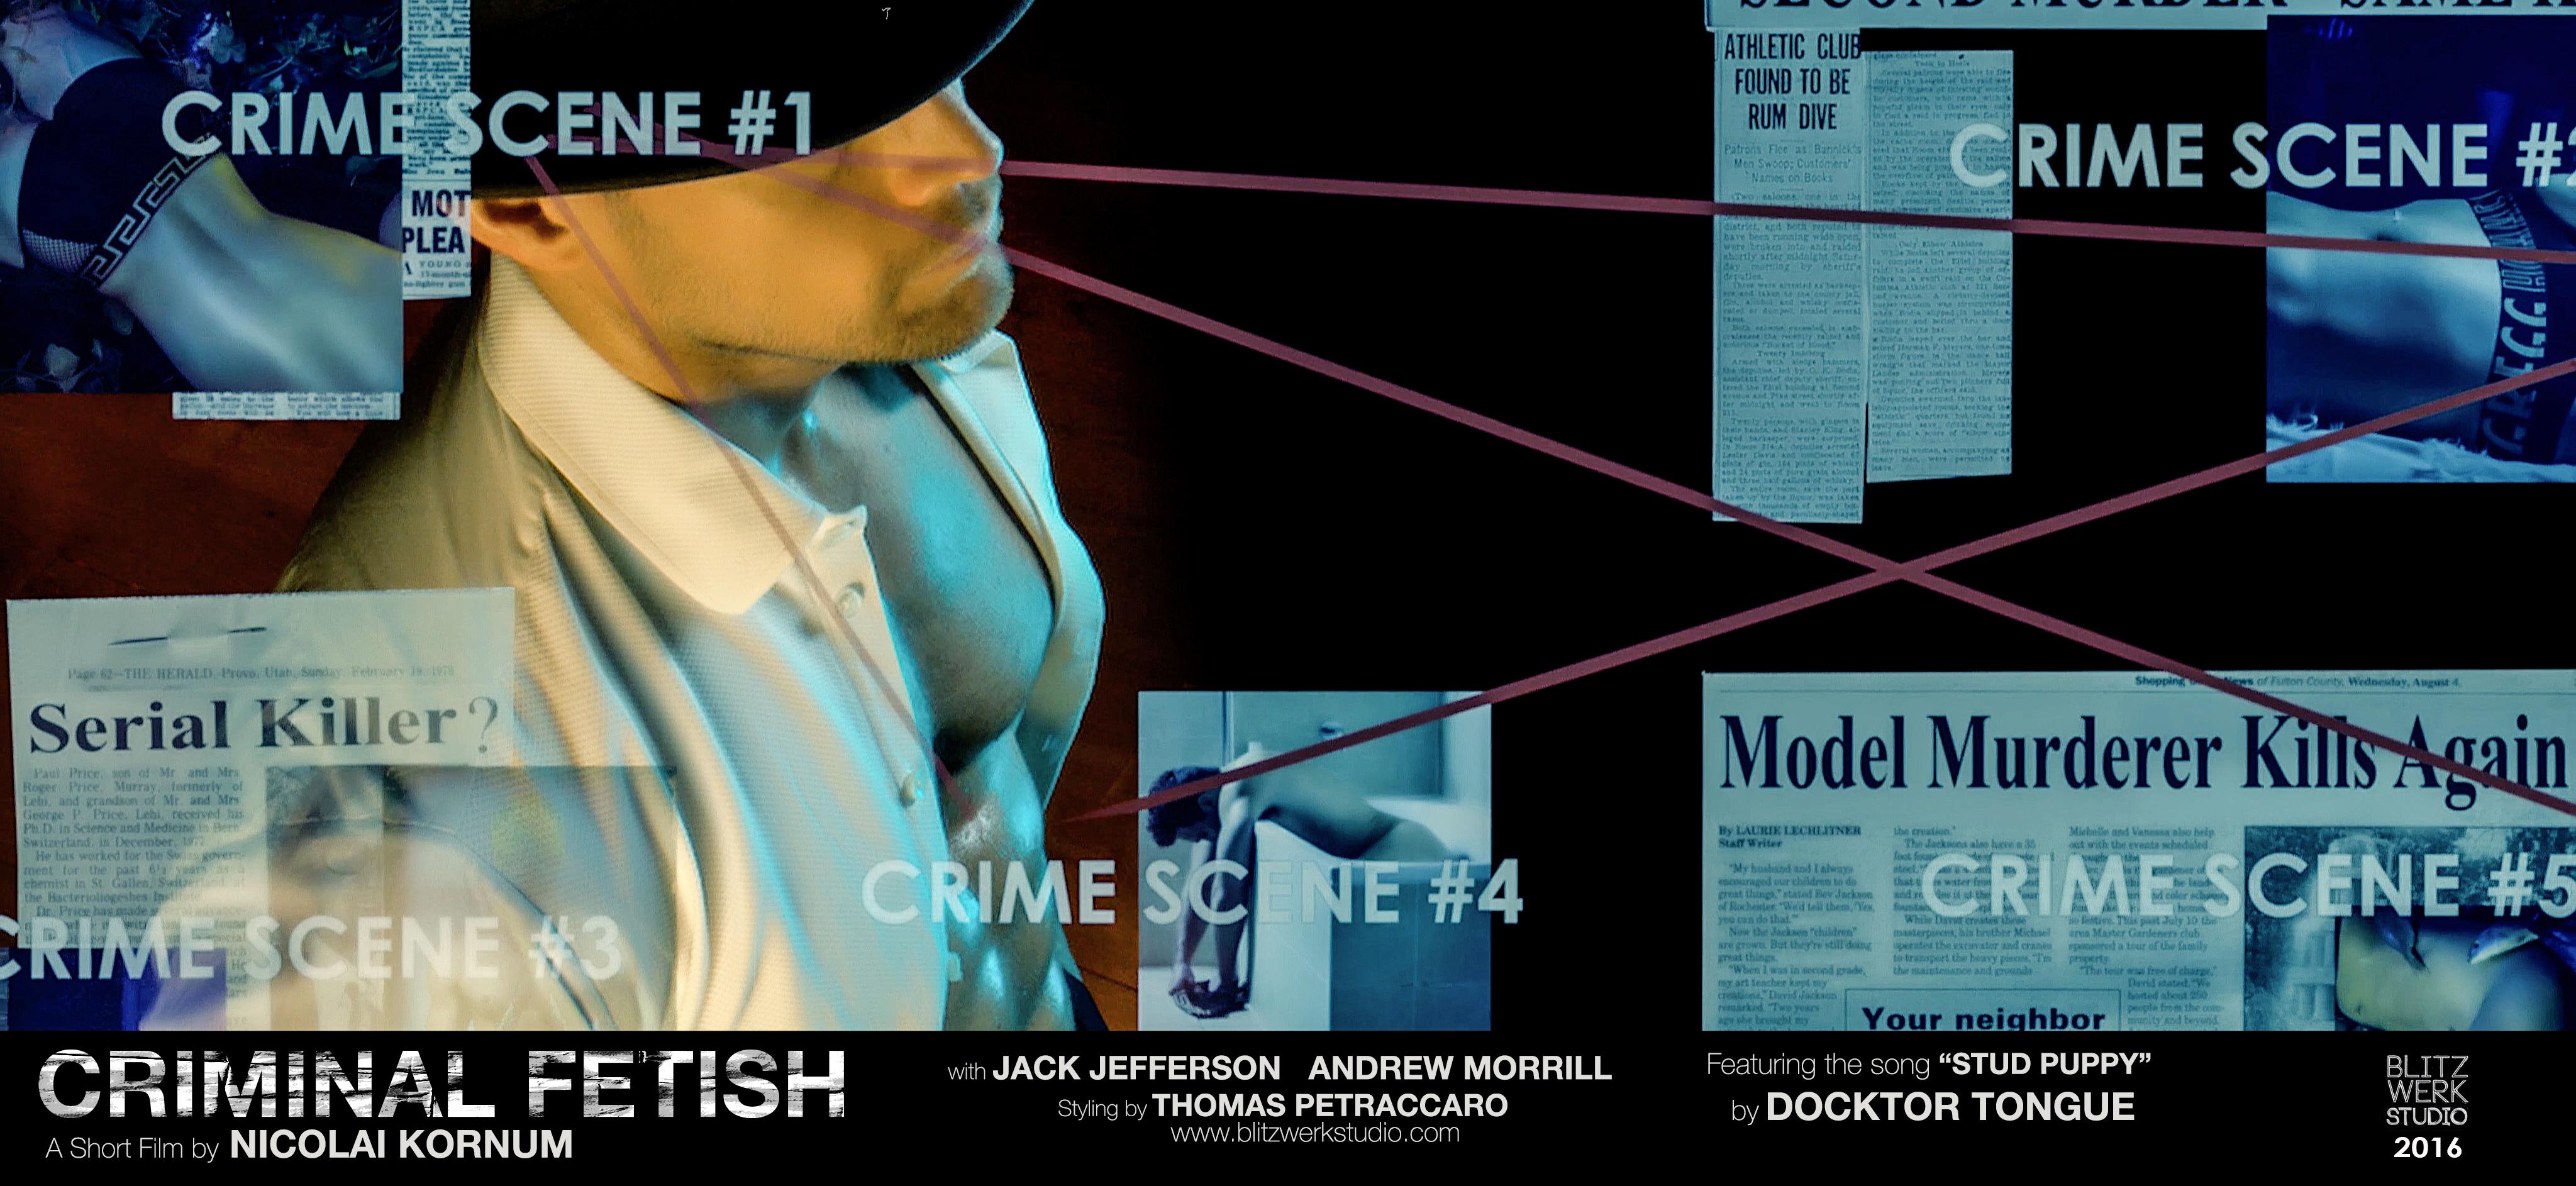 CRIMINAL FETISH Prod Still (2)